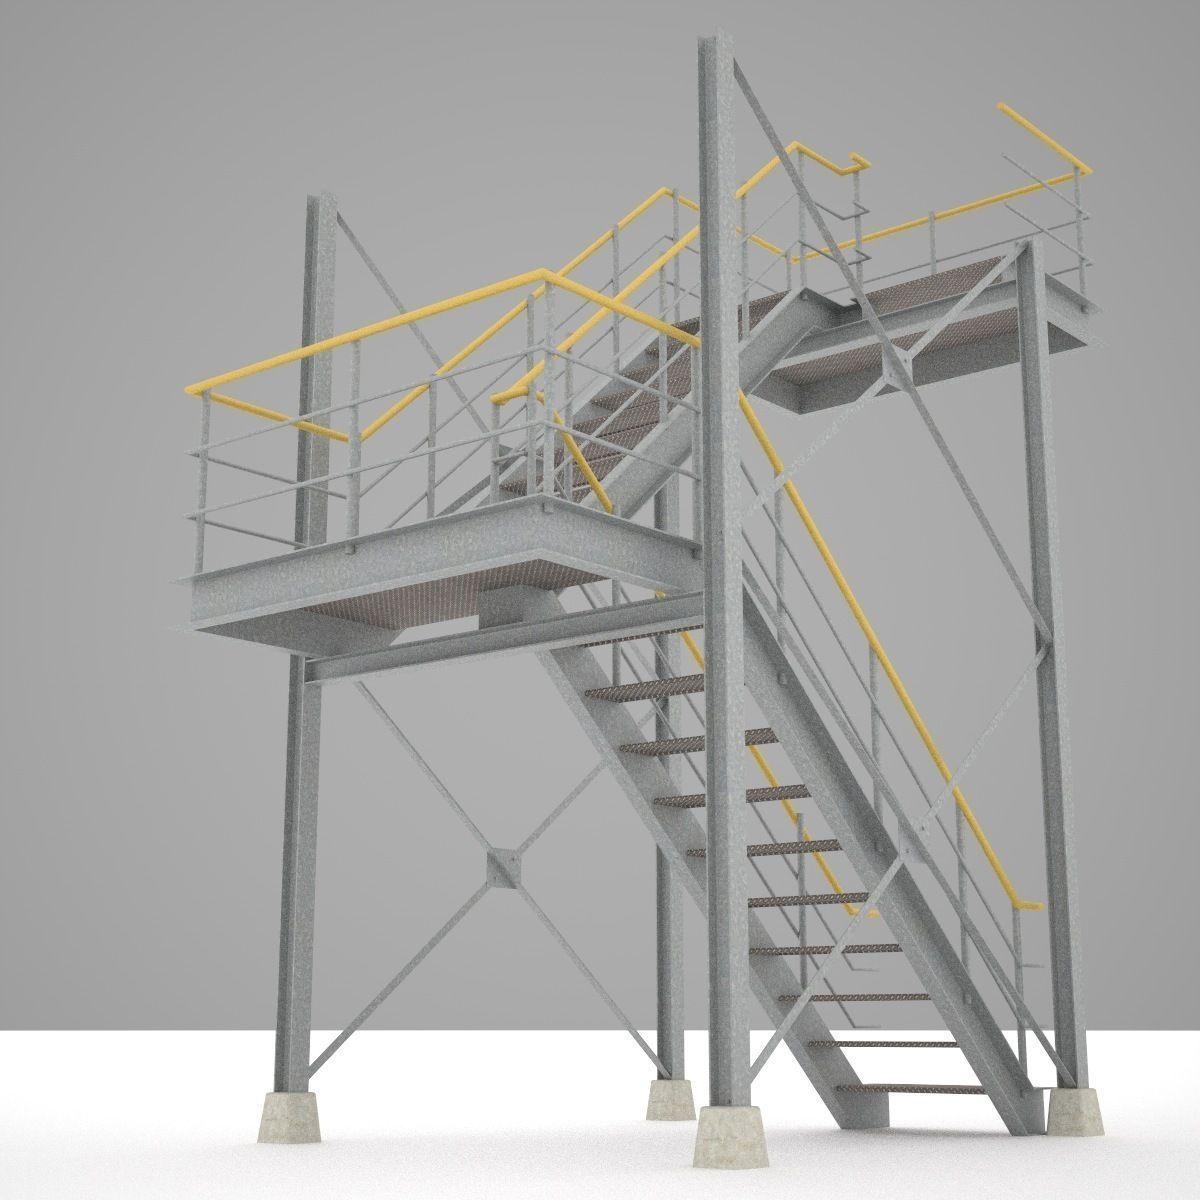 Industrial stairs 01 3d model obj 3ds fbx hrc xsi for Exterior 3d model